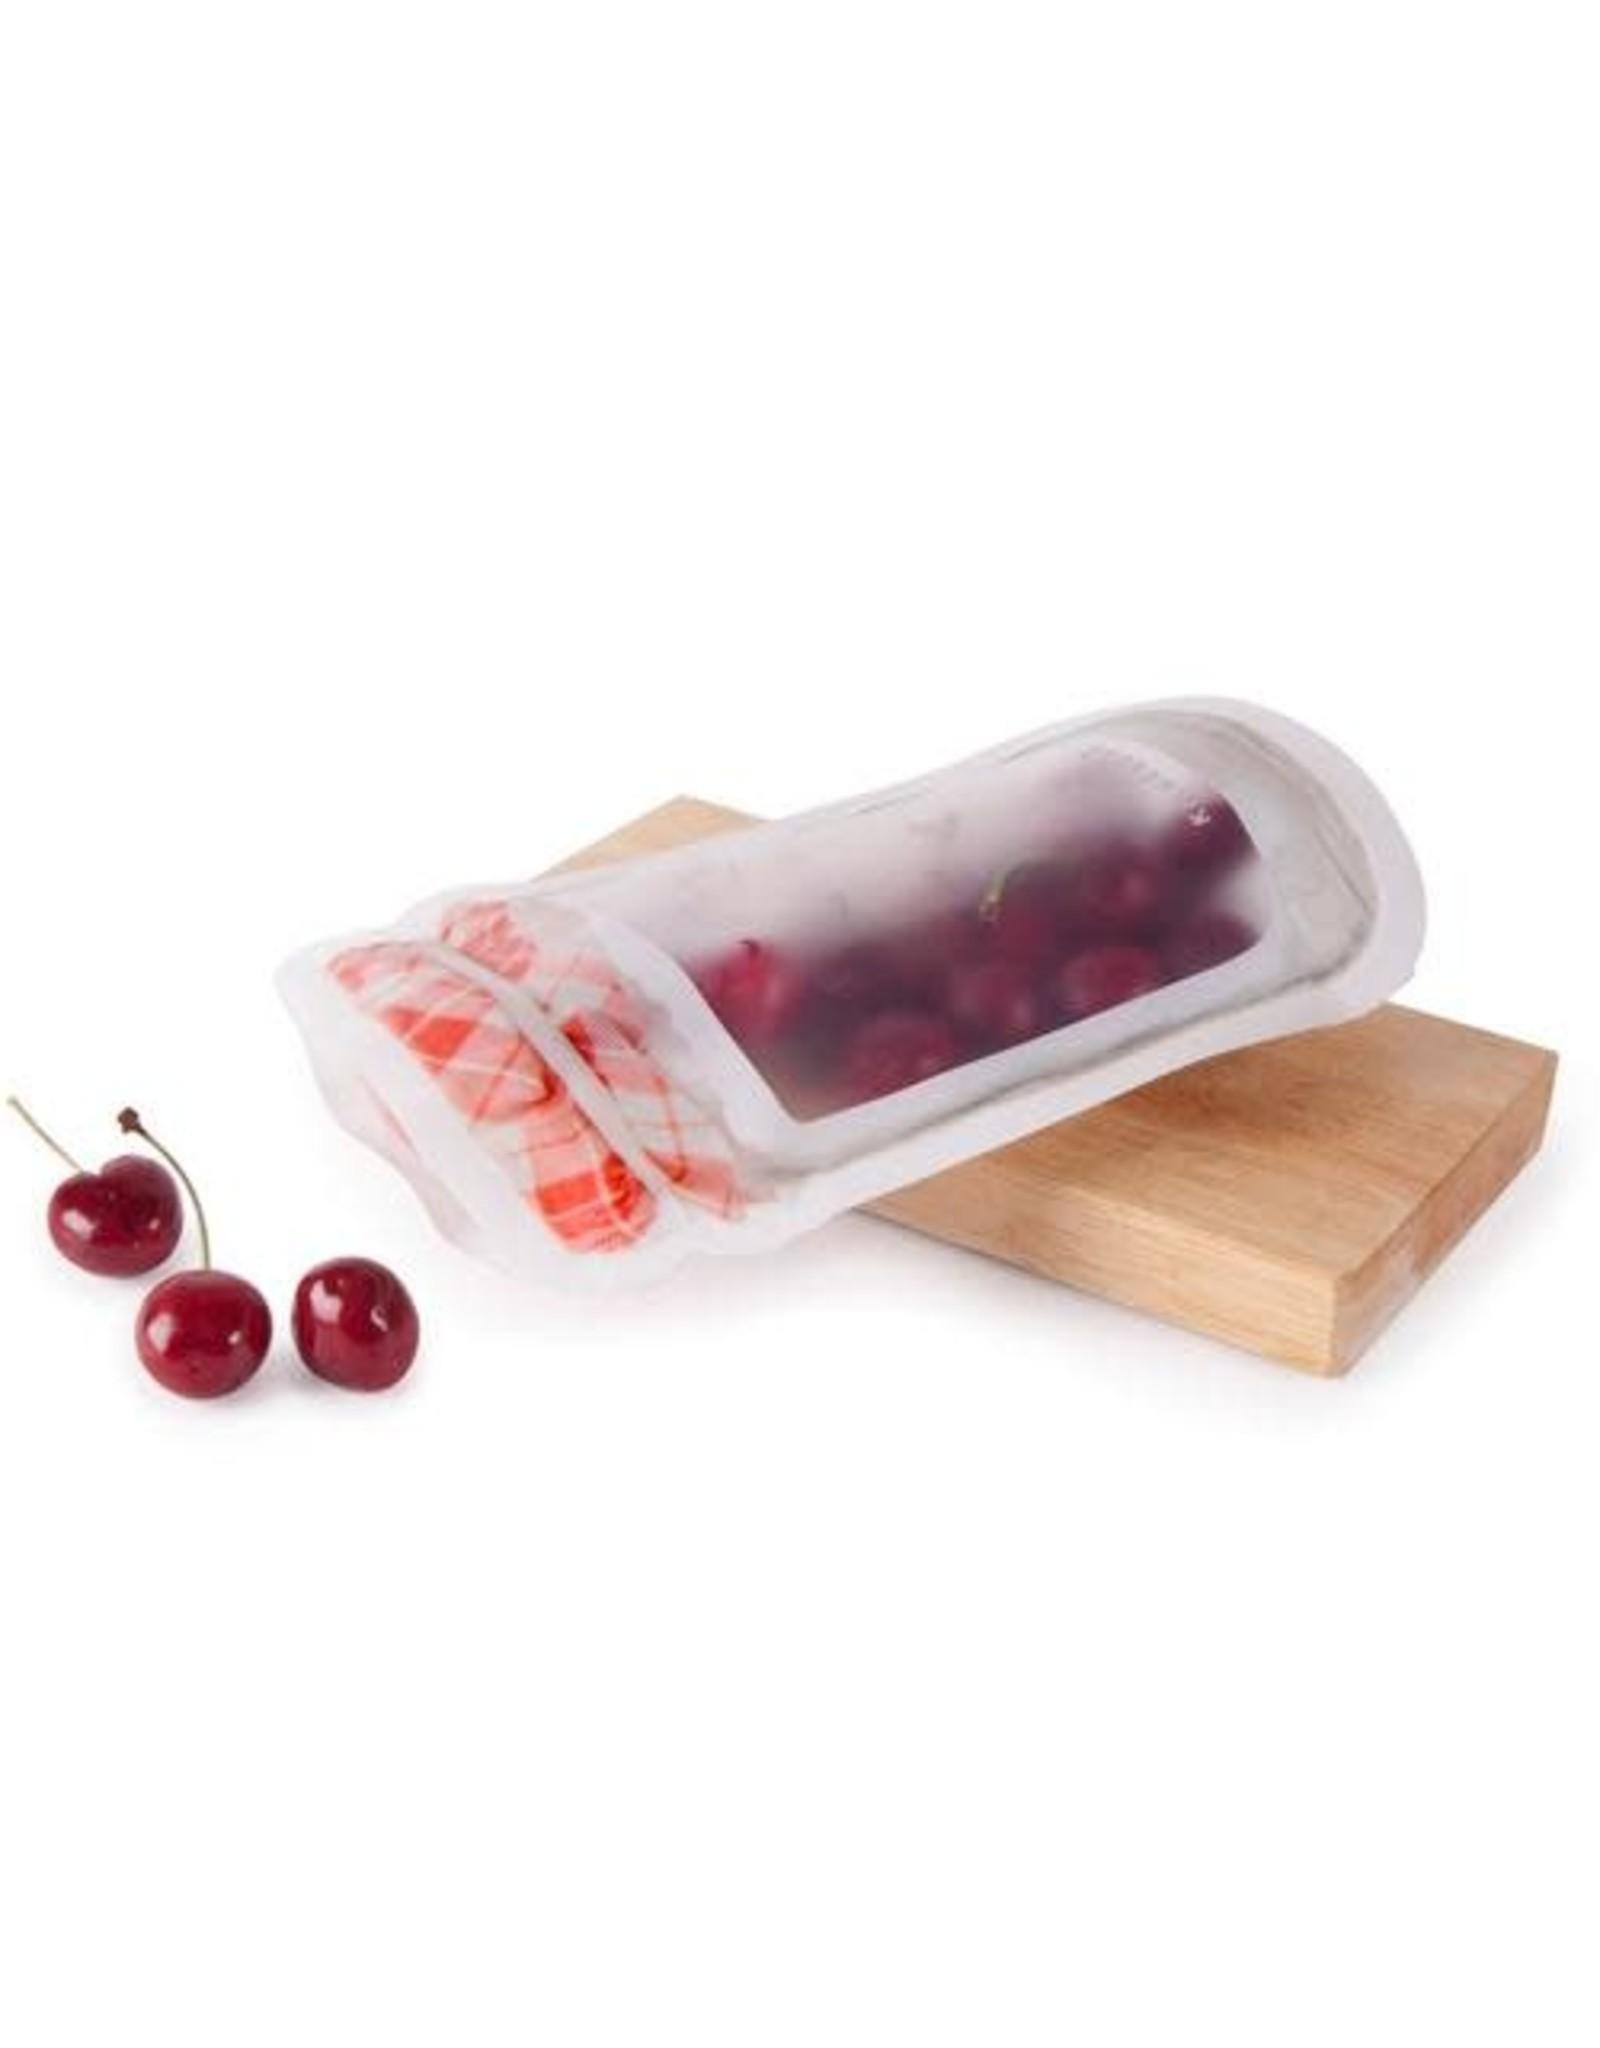 Jam Jar Medium Snack Bags, Set of 3